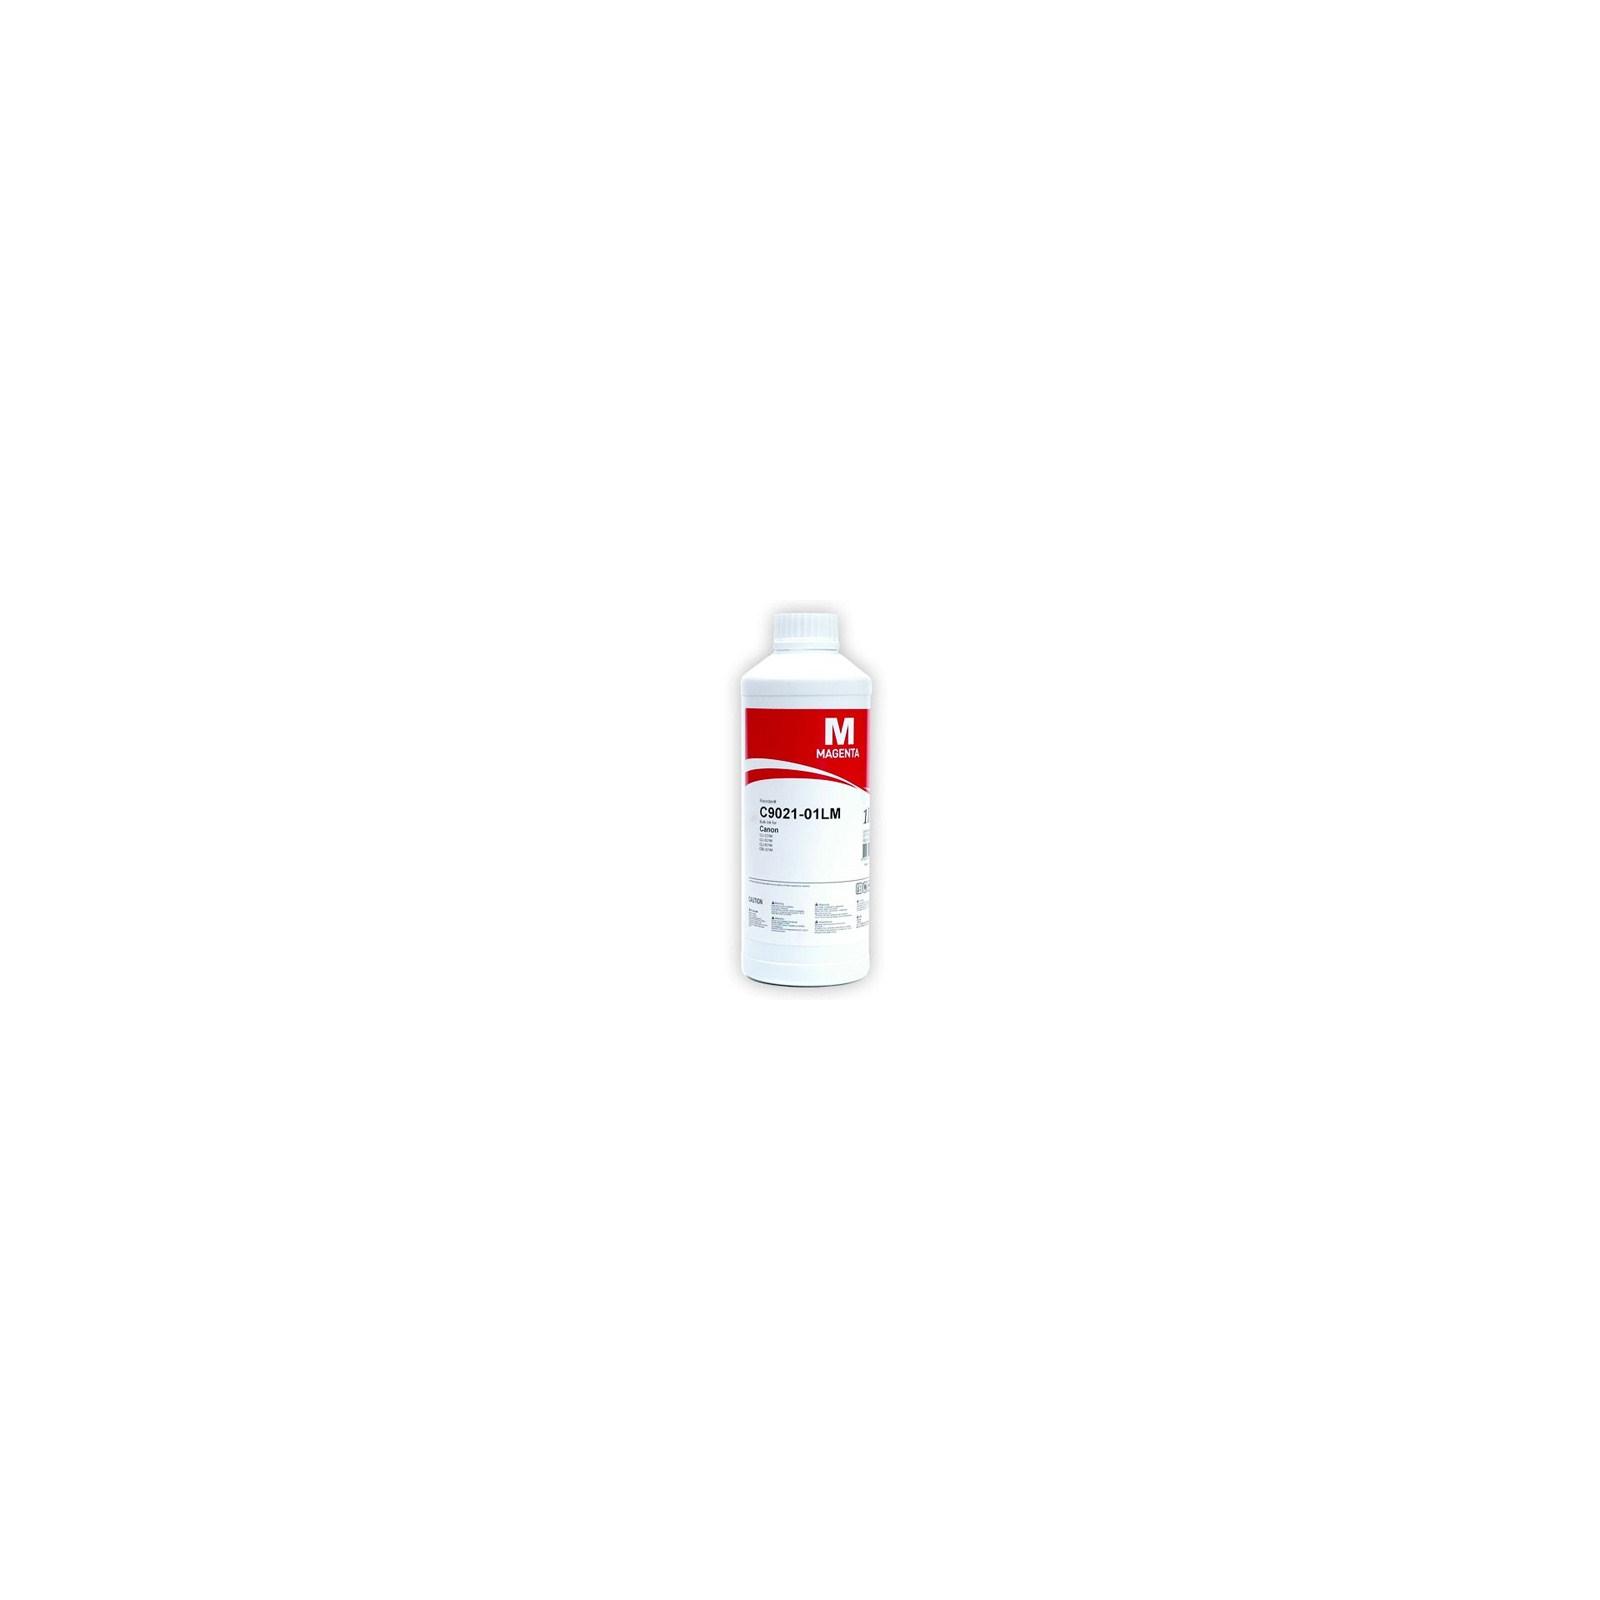 Чернила InkTec Canon CLI-521/221/821 CBI-321 Magenta (C9021-01LM)